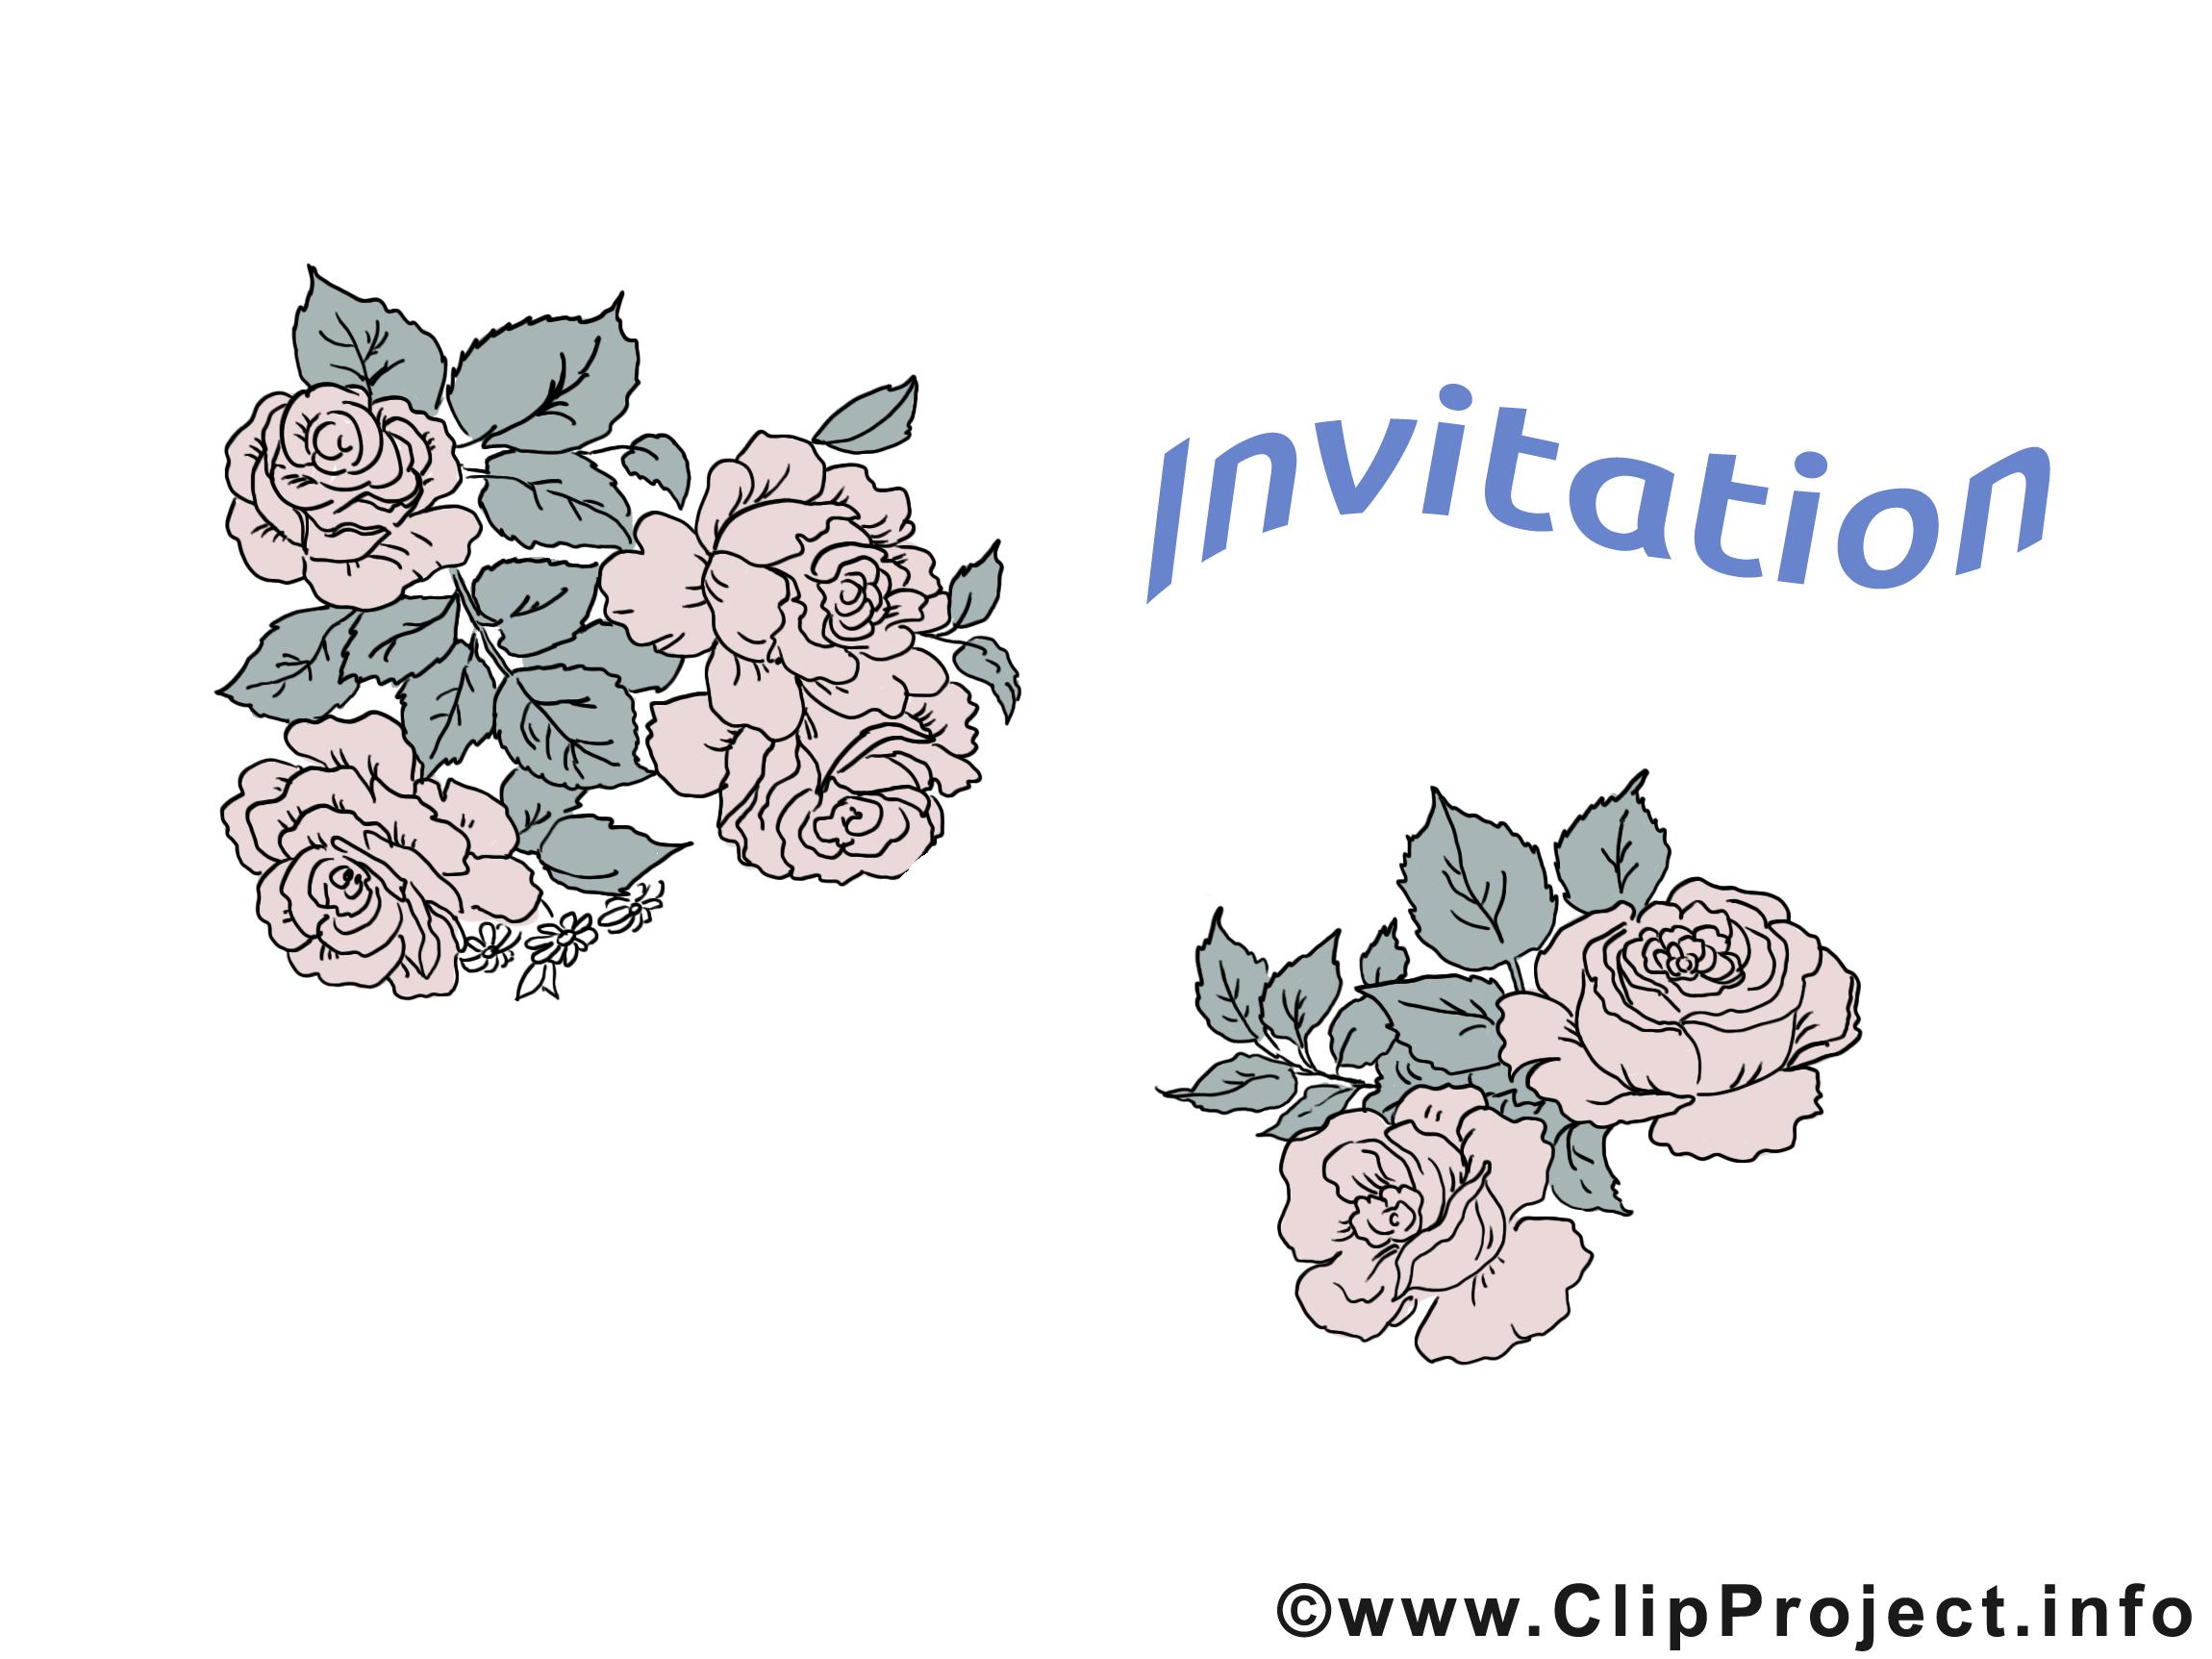 Roses clip art gratuit - Invitation dessin